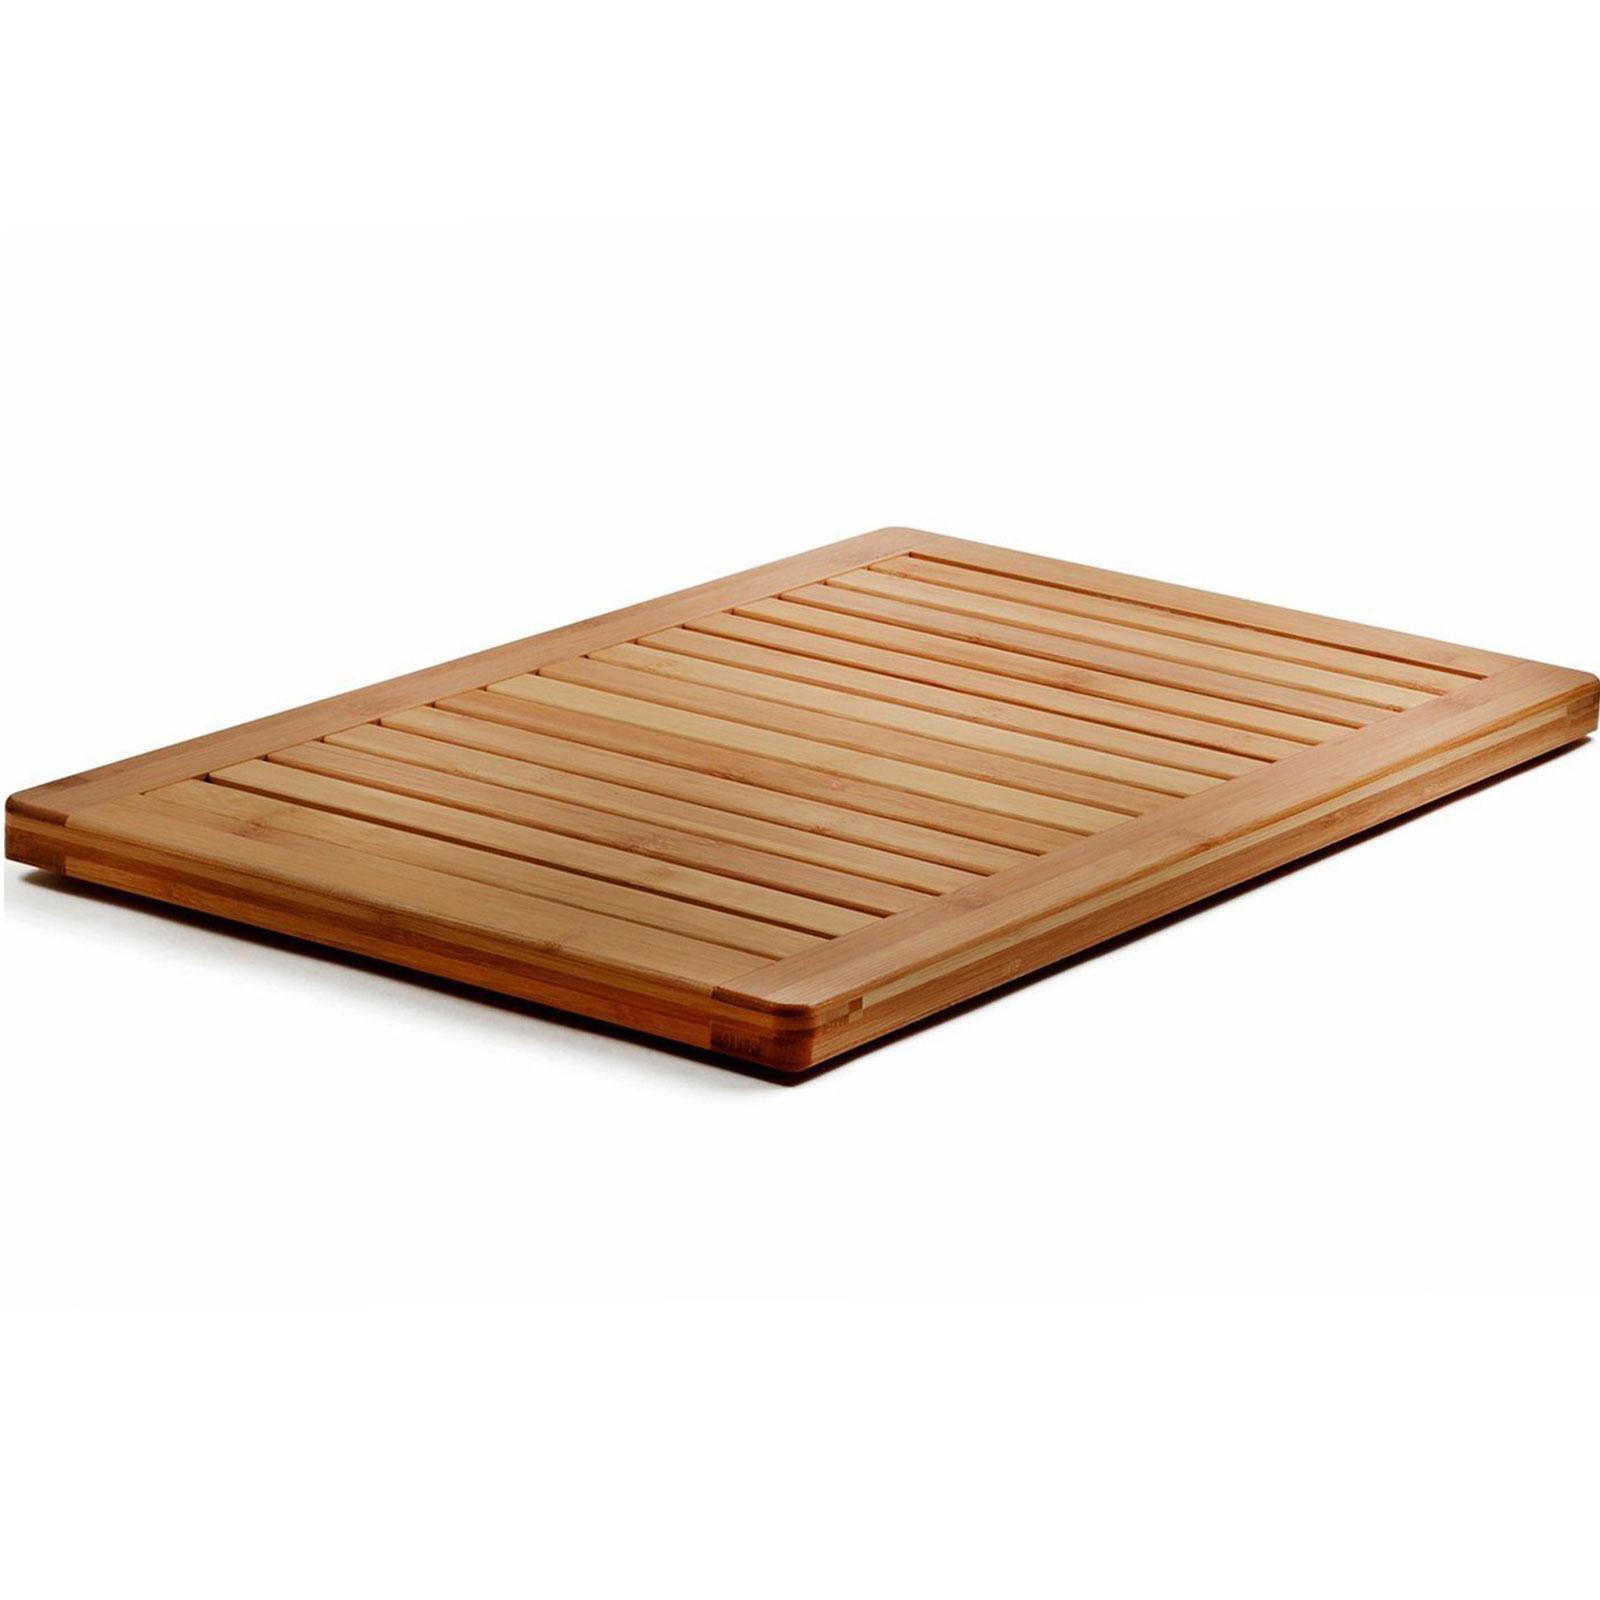 Bambusi 100 Natural Moso Bamboo Non Slip Floor Mat For Shower Spa Relaxation